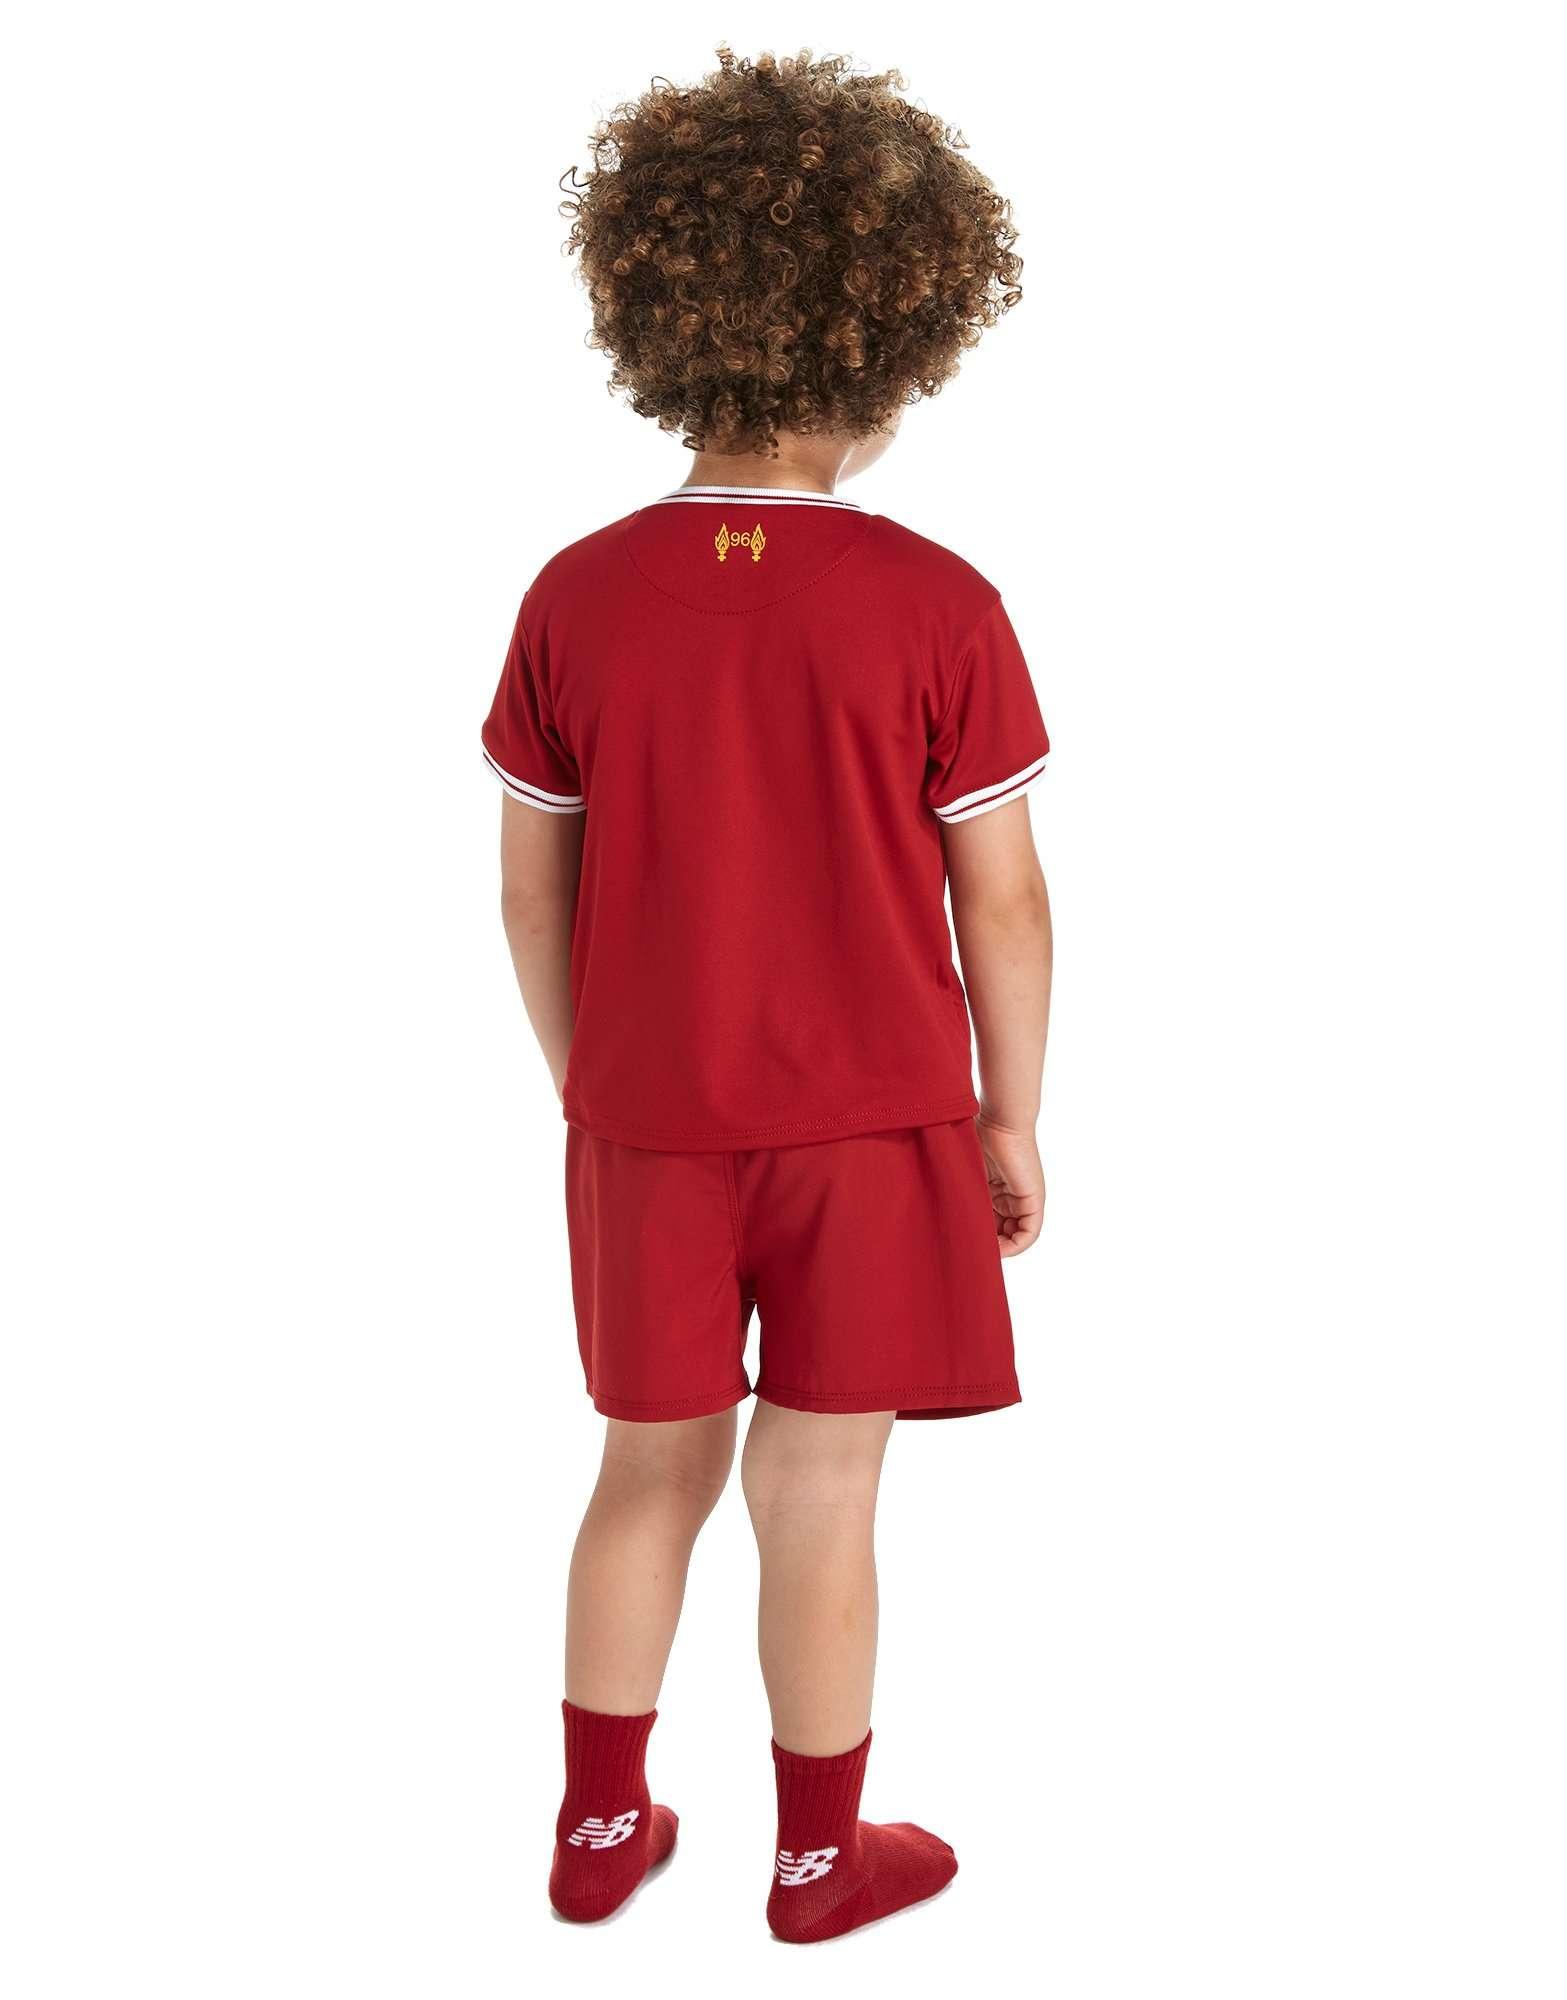 New Balance Liverpool FC 2017/18 Home Kit Infant